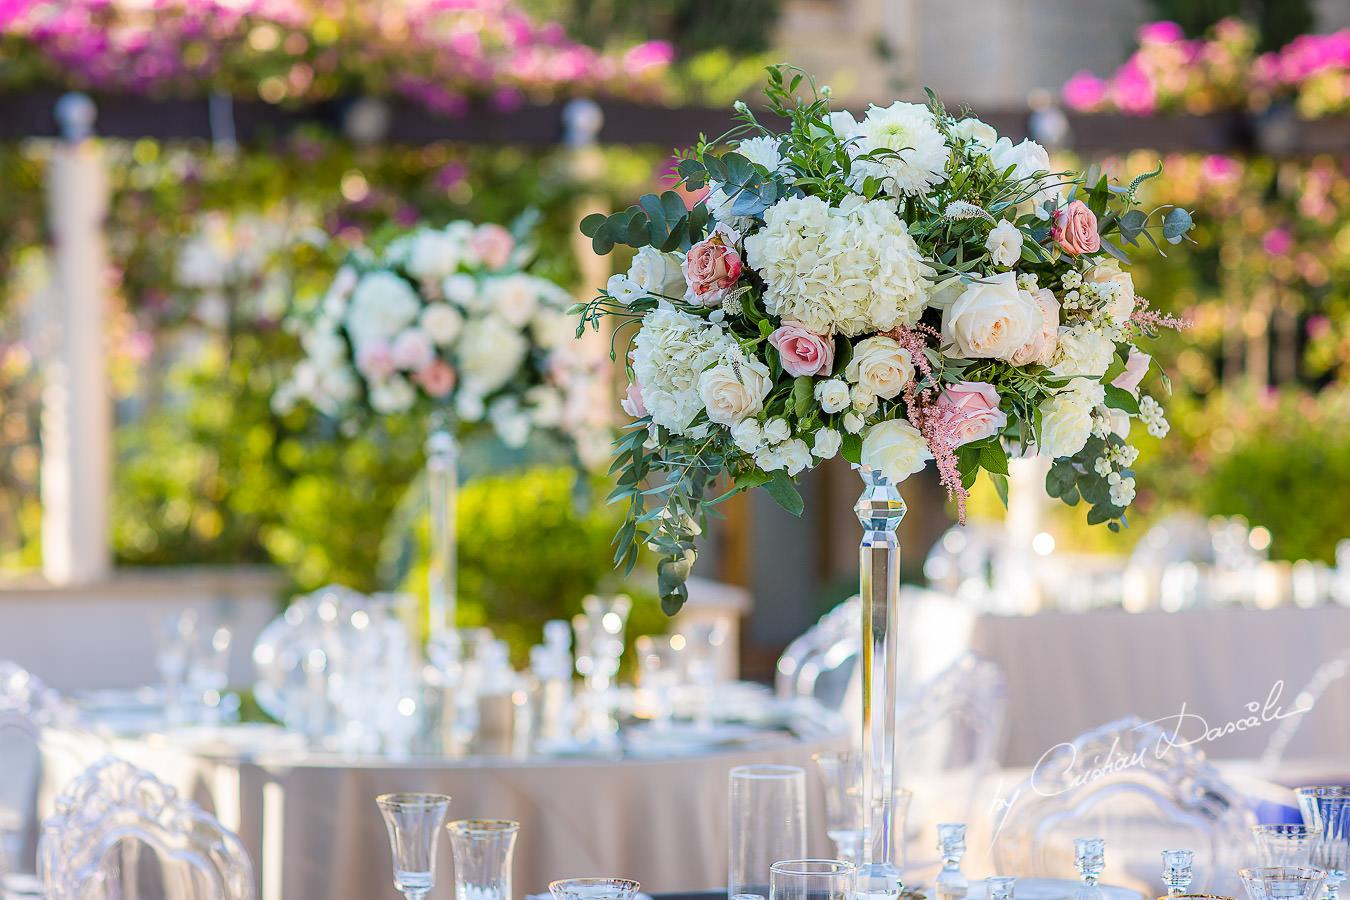 Wedding decorations captured by Cristian Dascalu during an elegant Aphrodite Hills Wedding in Cyprus.